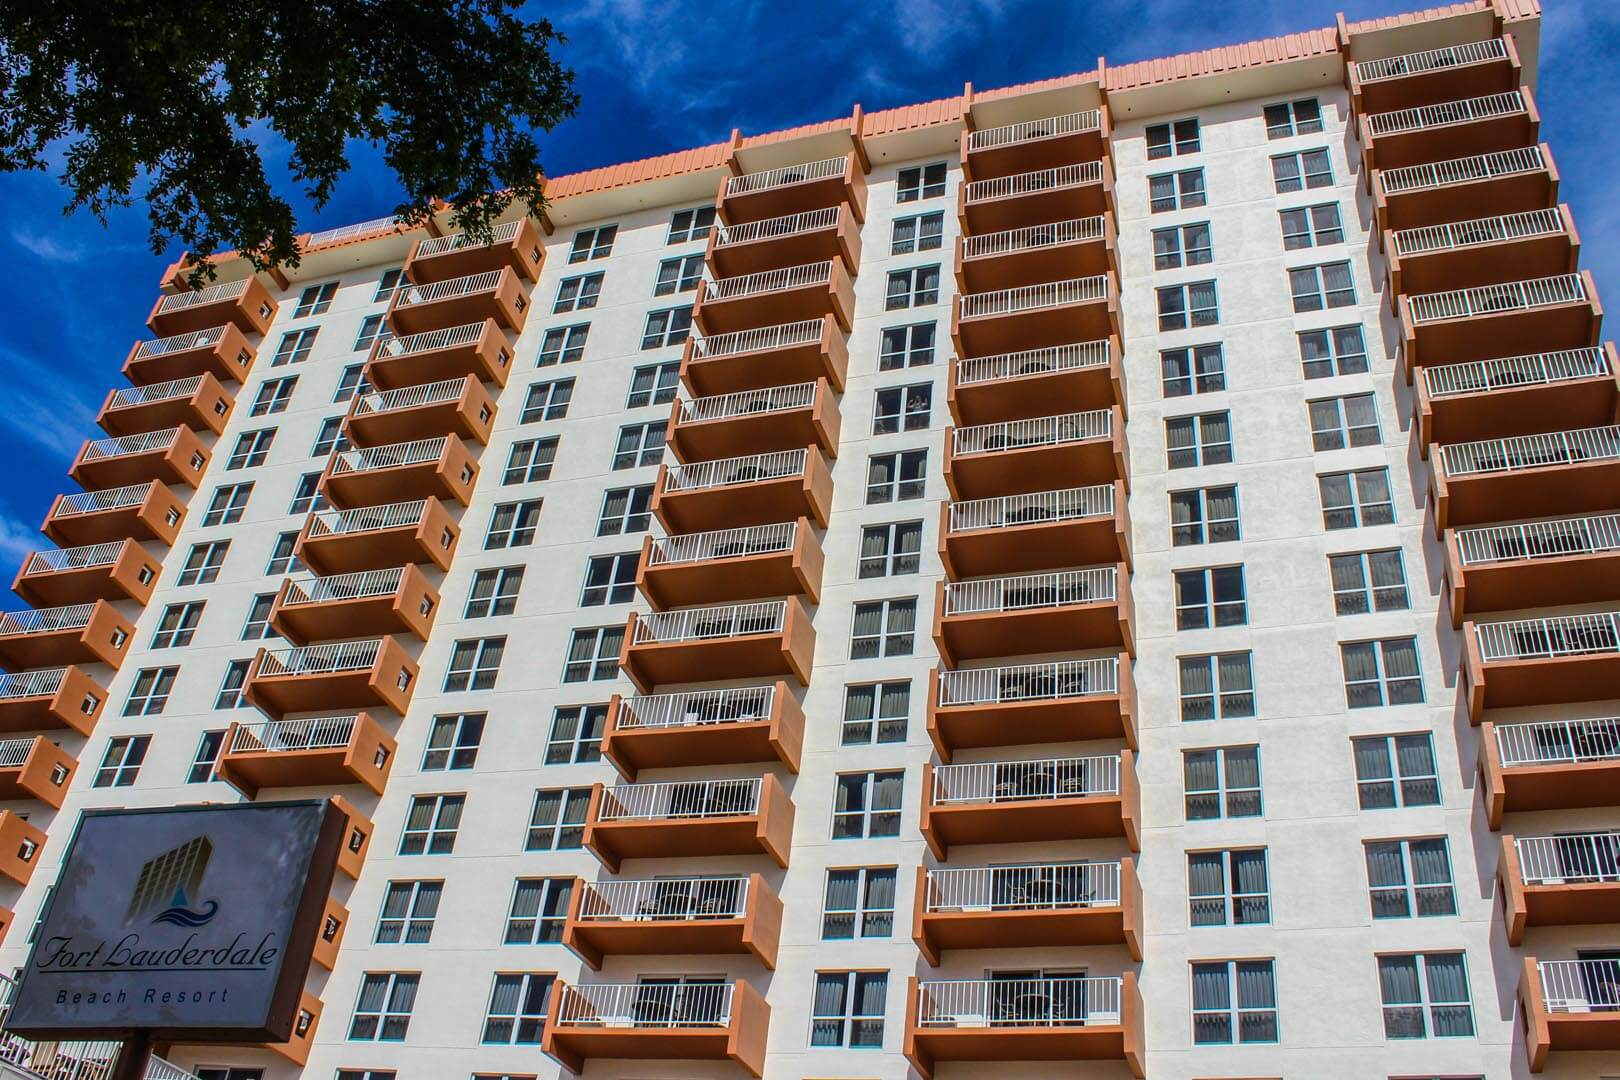 Ft Lauderdale Beach Resort Club Building